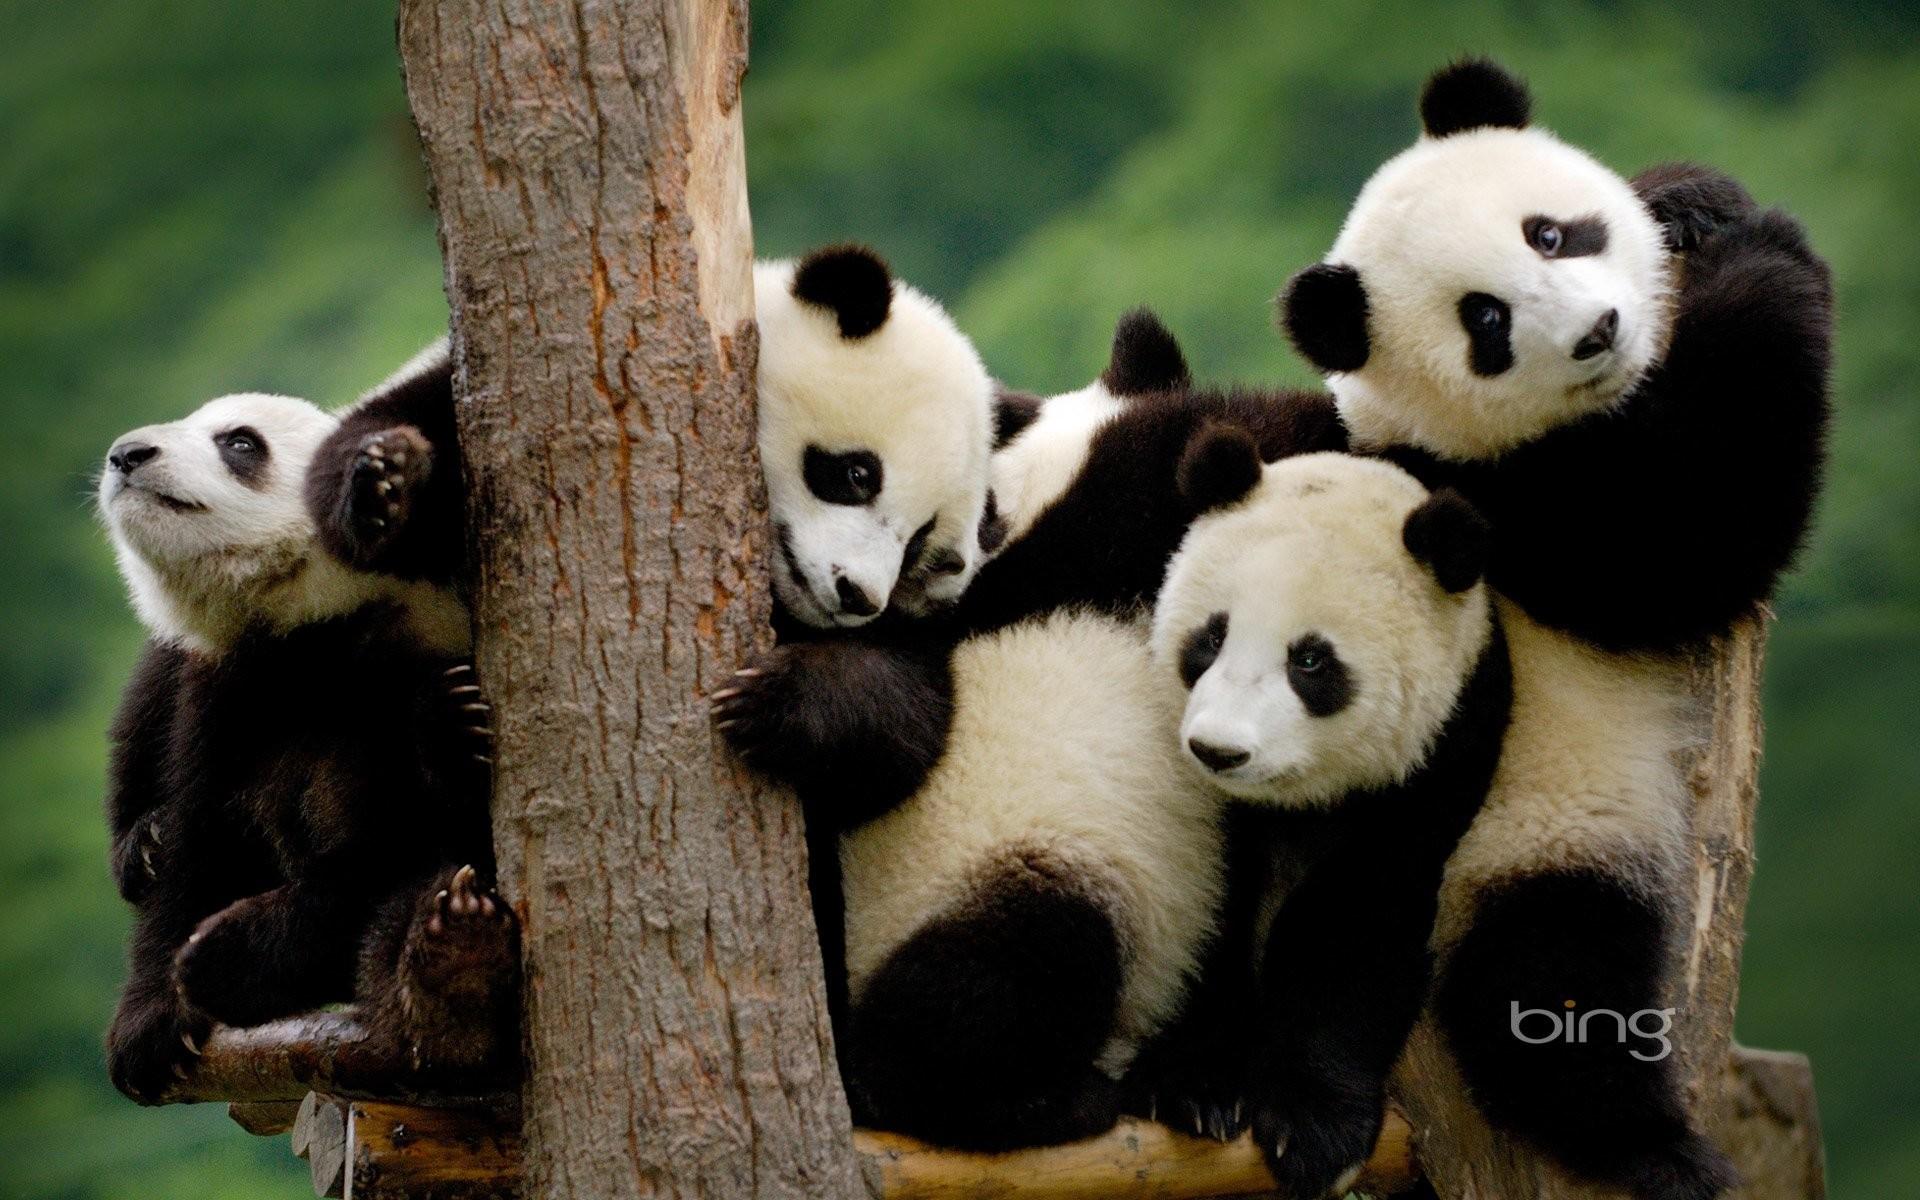 hinh gau truc panda 1